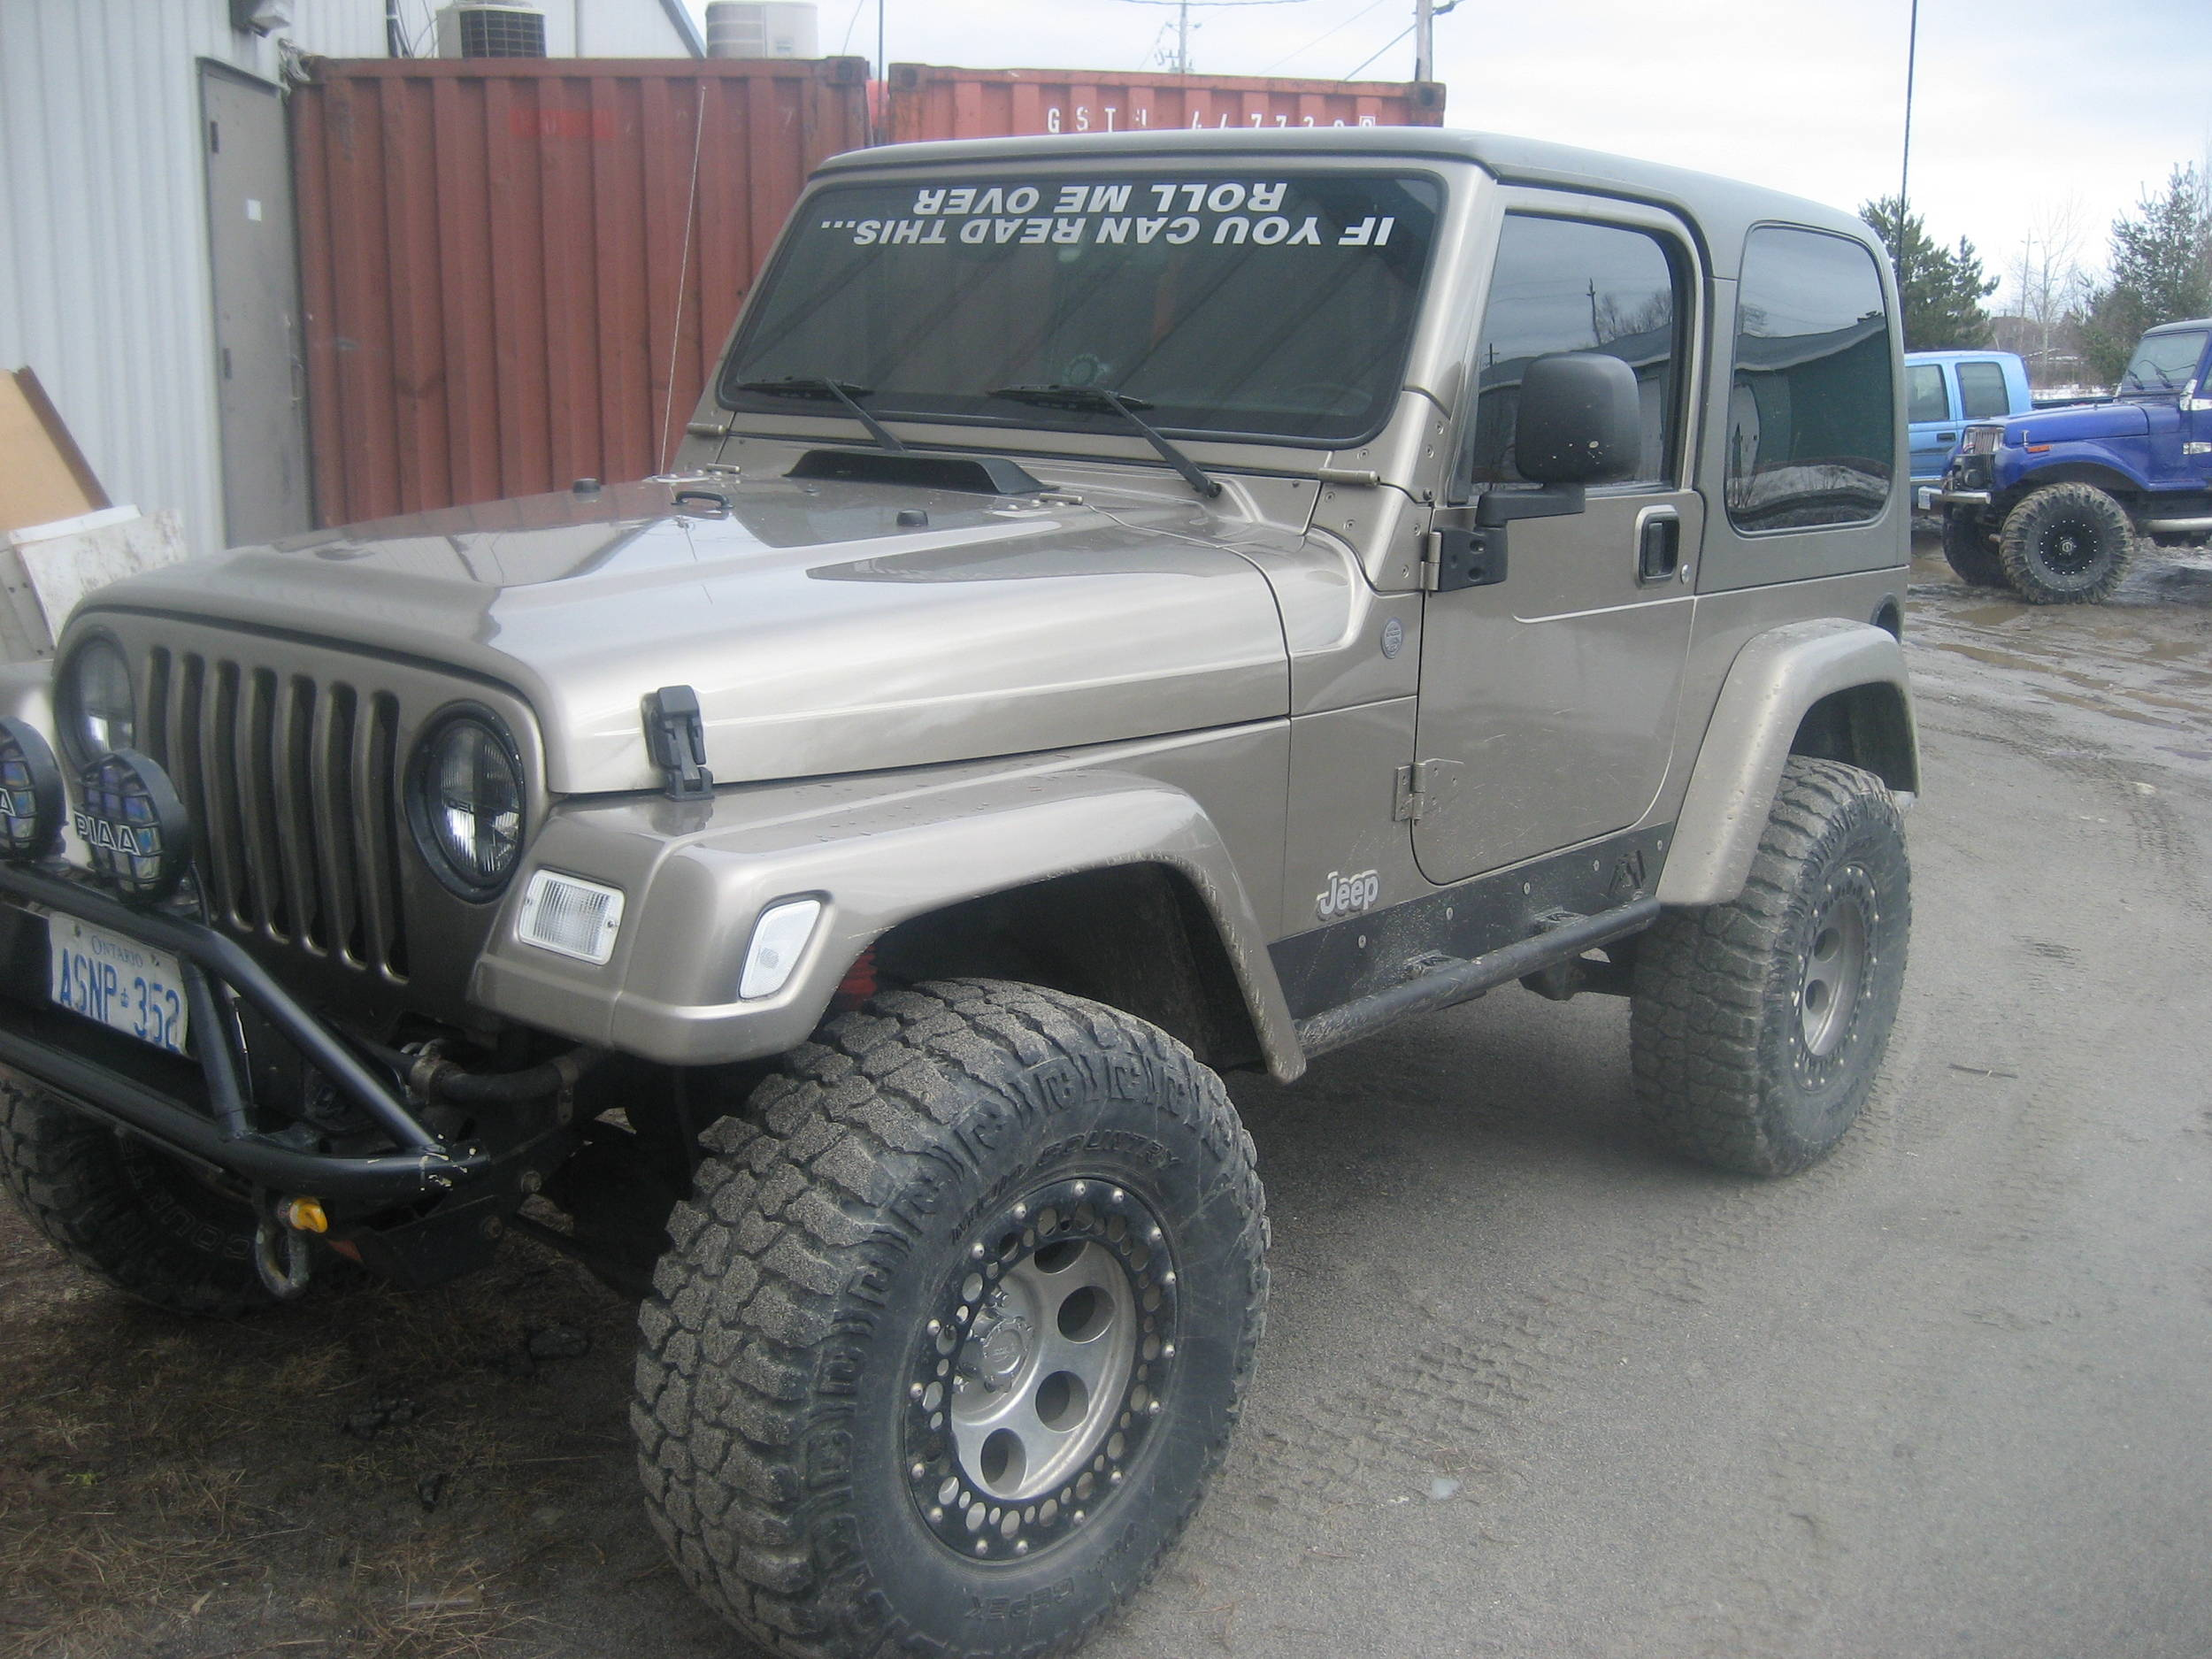 ~~windshield sticker!!!! - Page 2 - JeepForum.com